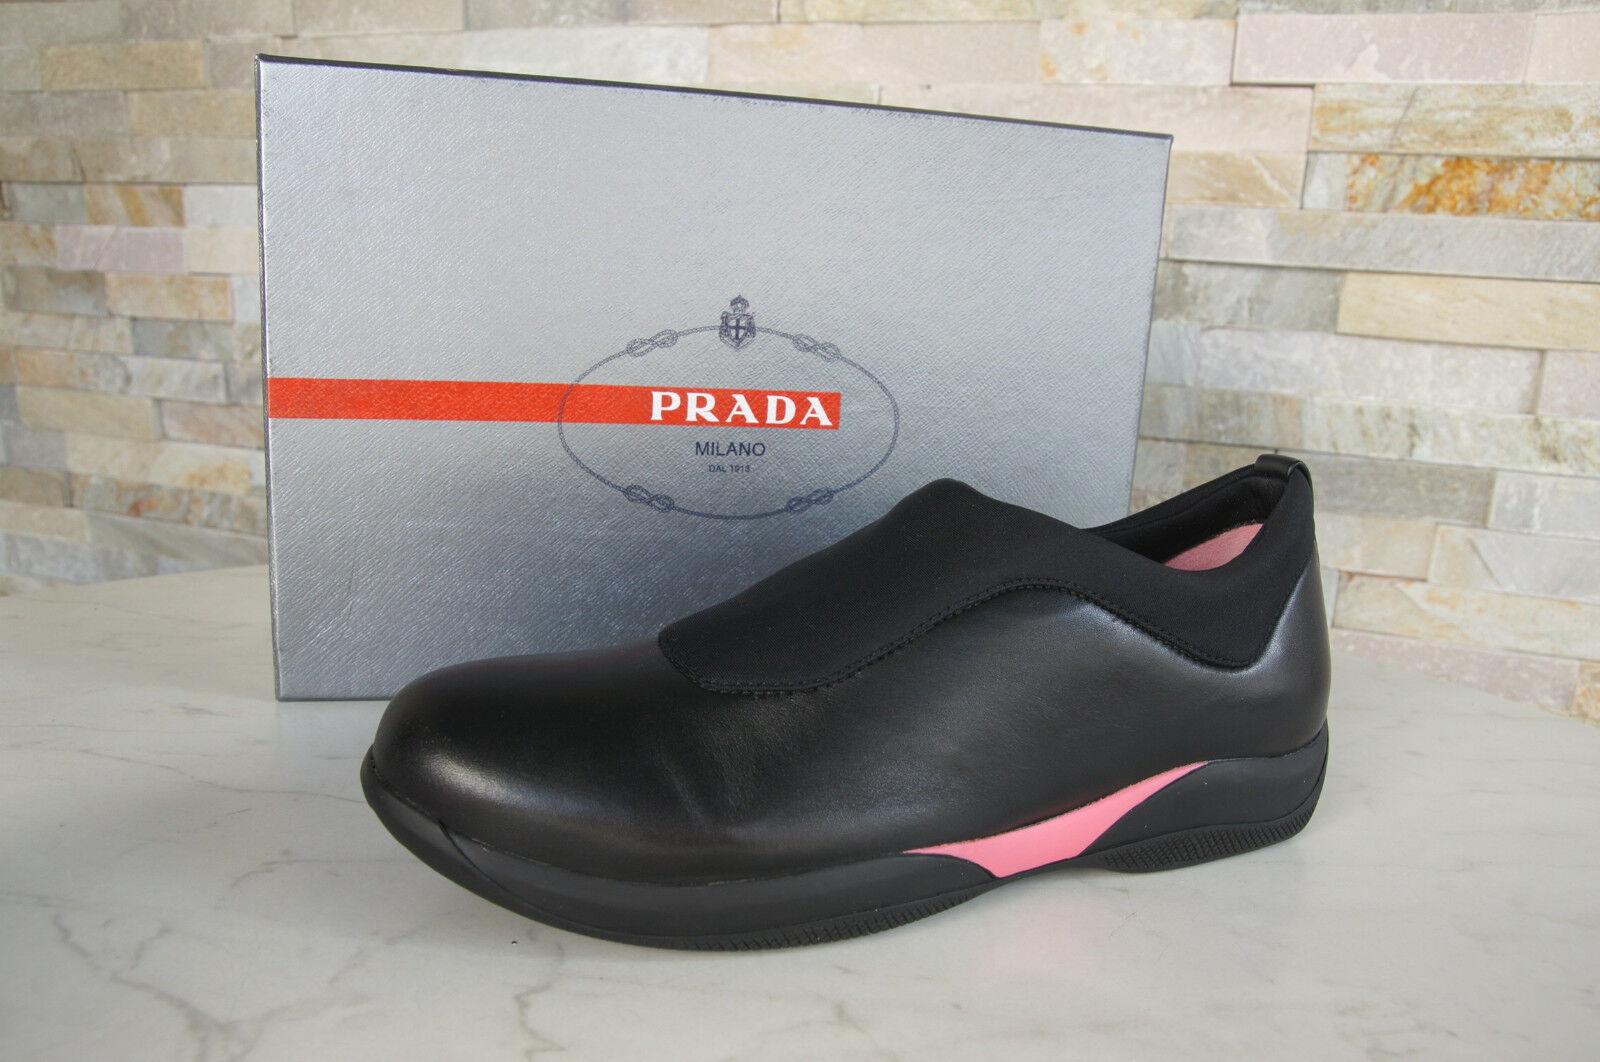 PRADA  38,5 Slipper Mokassins Slip-On Halbschuhe Schuhe schwarz pink NEU